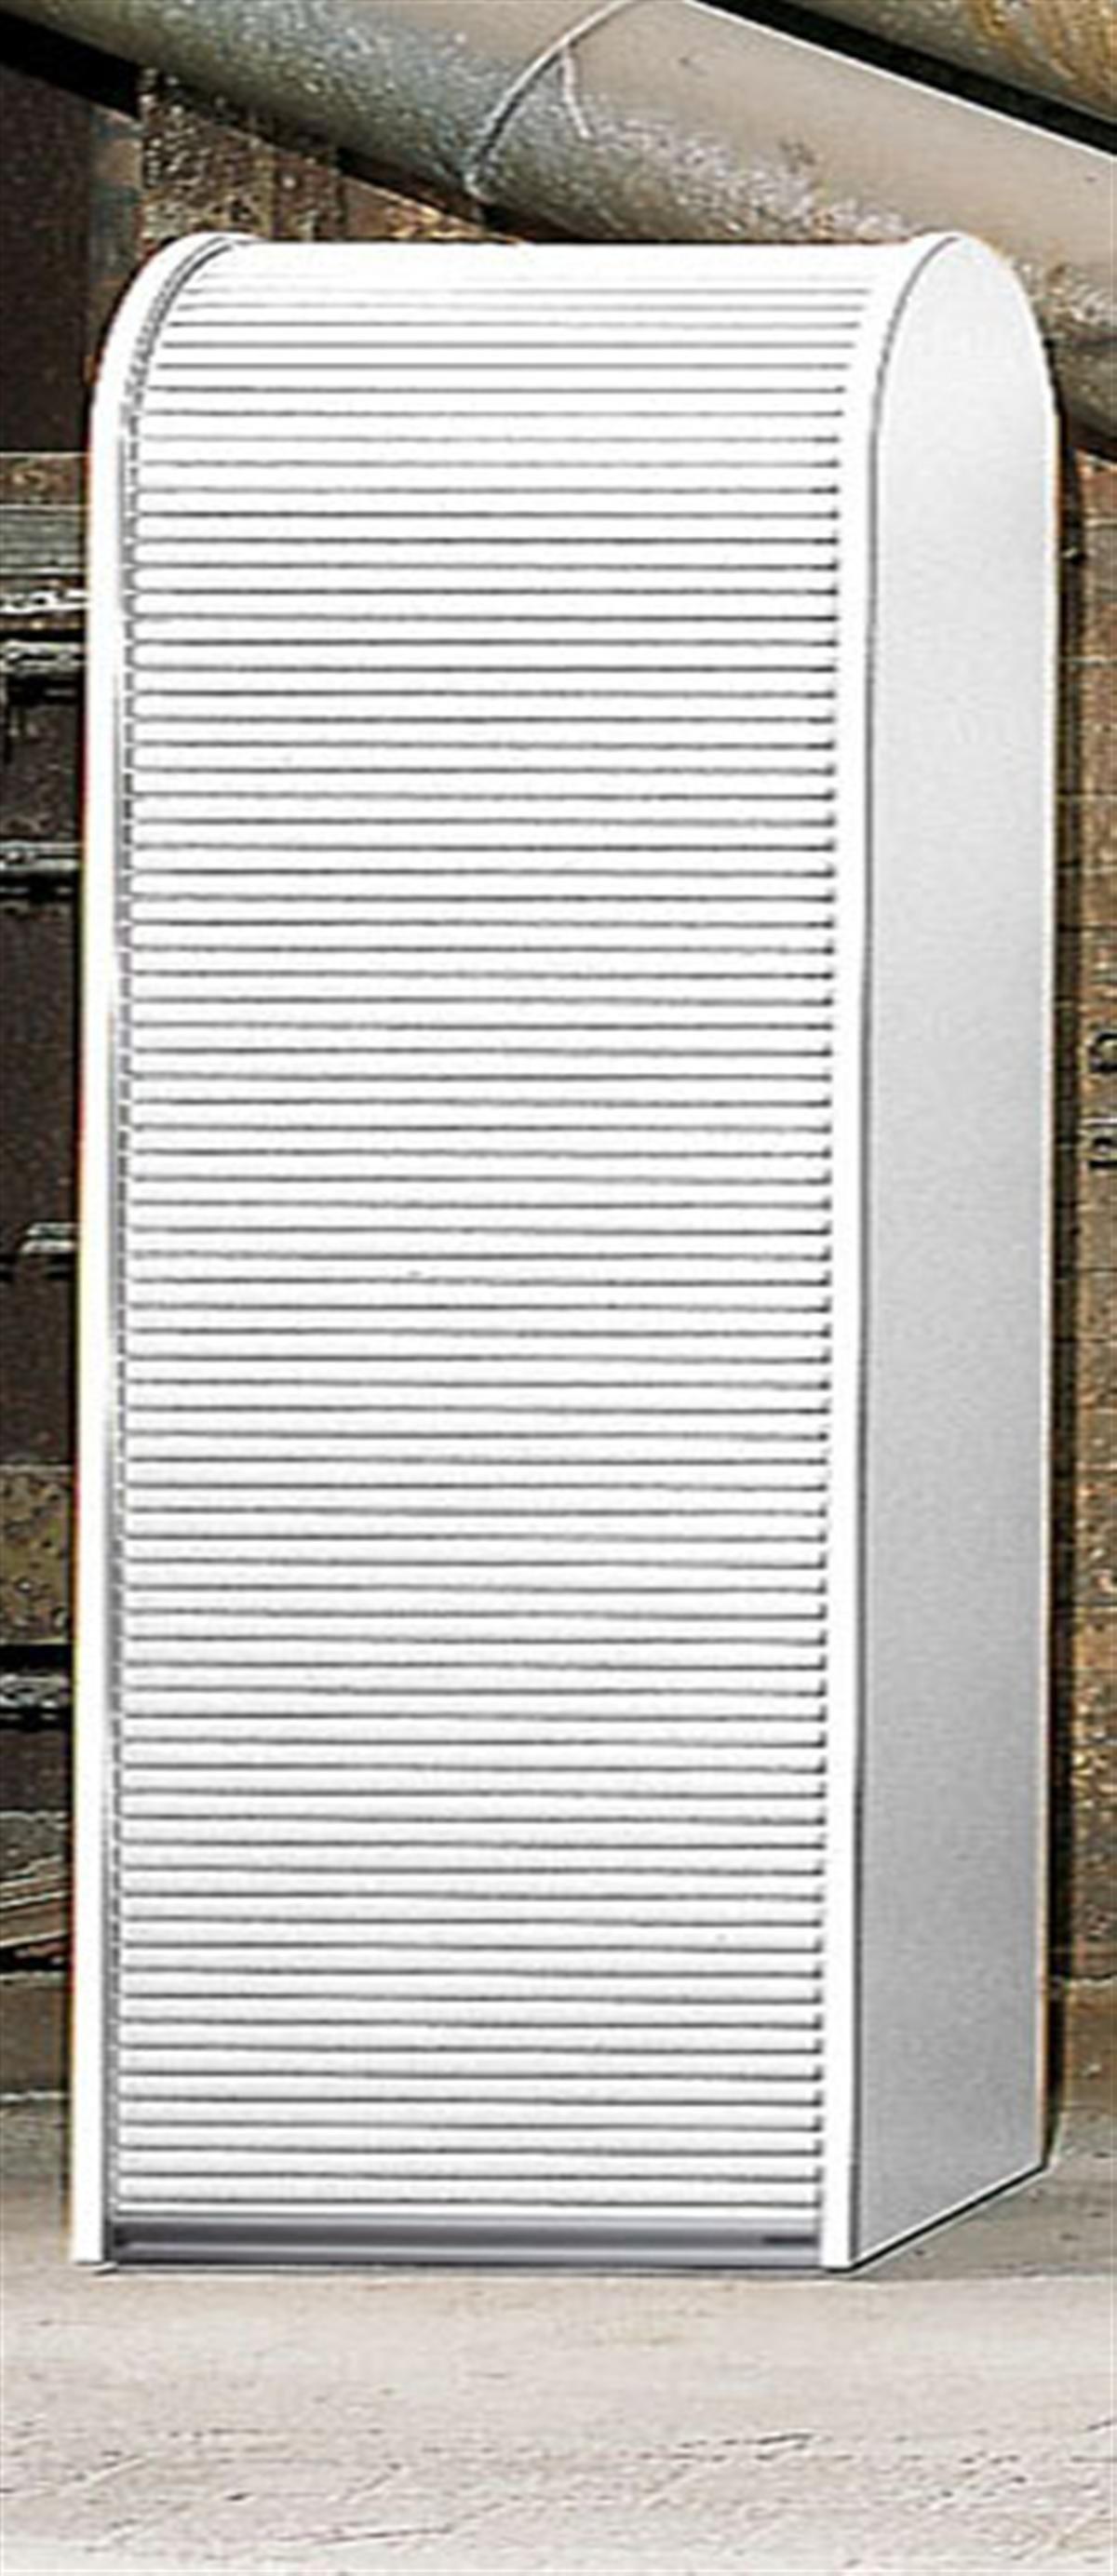 MS-Schuon Rolladenschrank Aktenschrank mit 4 Fachböden abschließbar »KLENK COLLECTION« | Büro > Büroschränke > Aktenschränke | Aluminium | MS-Schuon